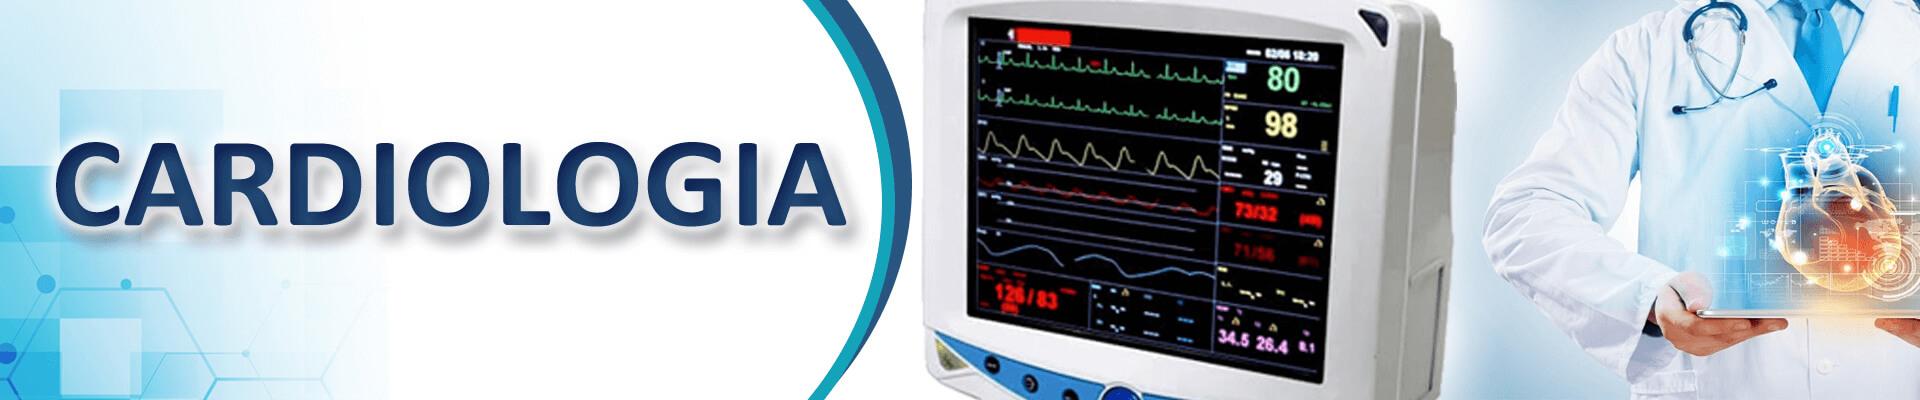 Banner principal da categoria cardiologia